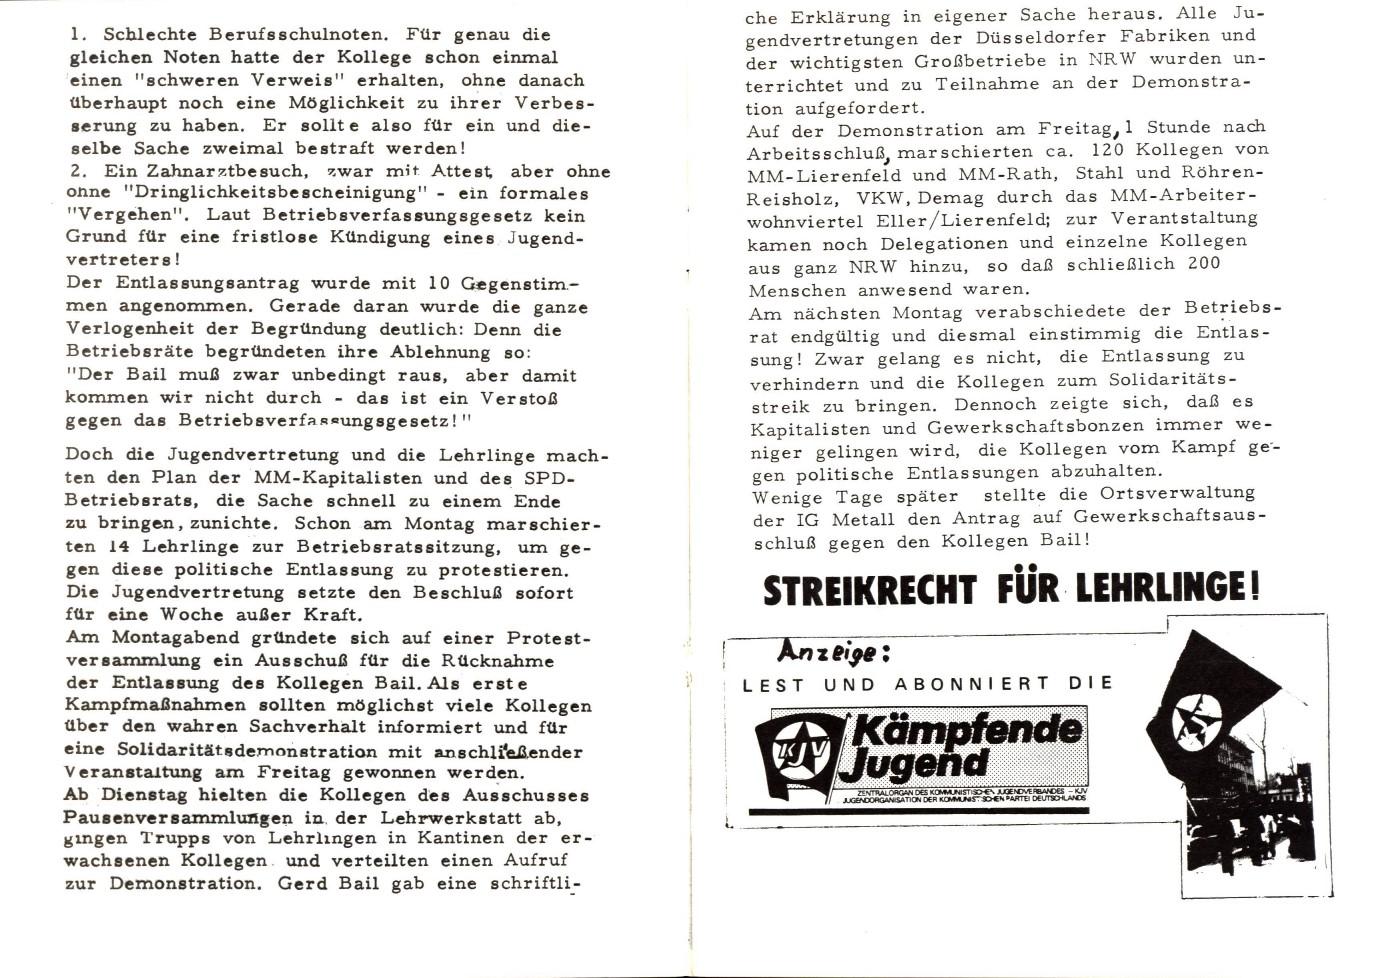 KJV_1973_NK_Arbeiterjugend_05